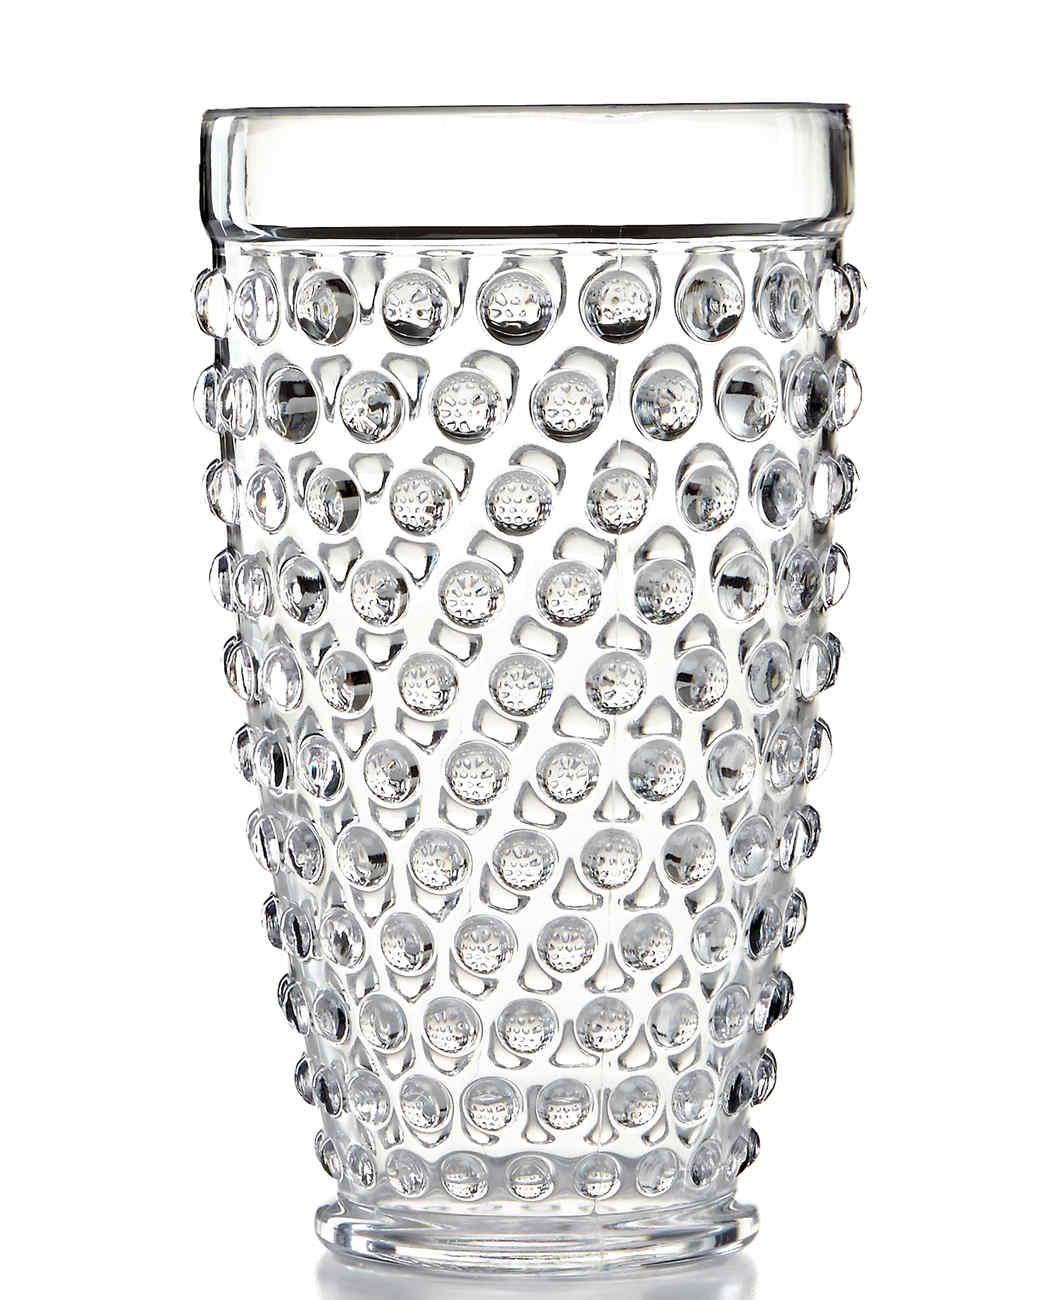 msmacys-plastic-tallglass-mrkt-0514.jpg